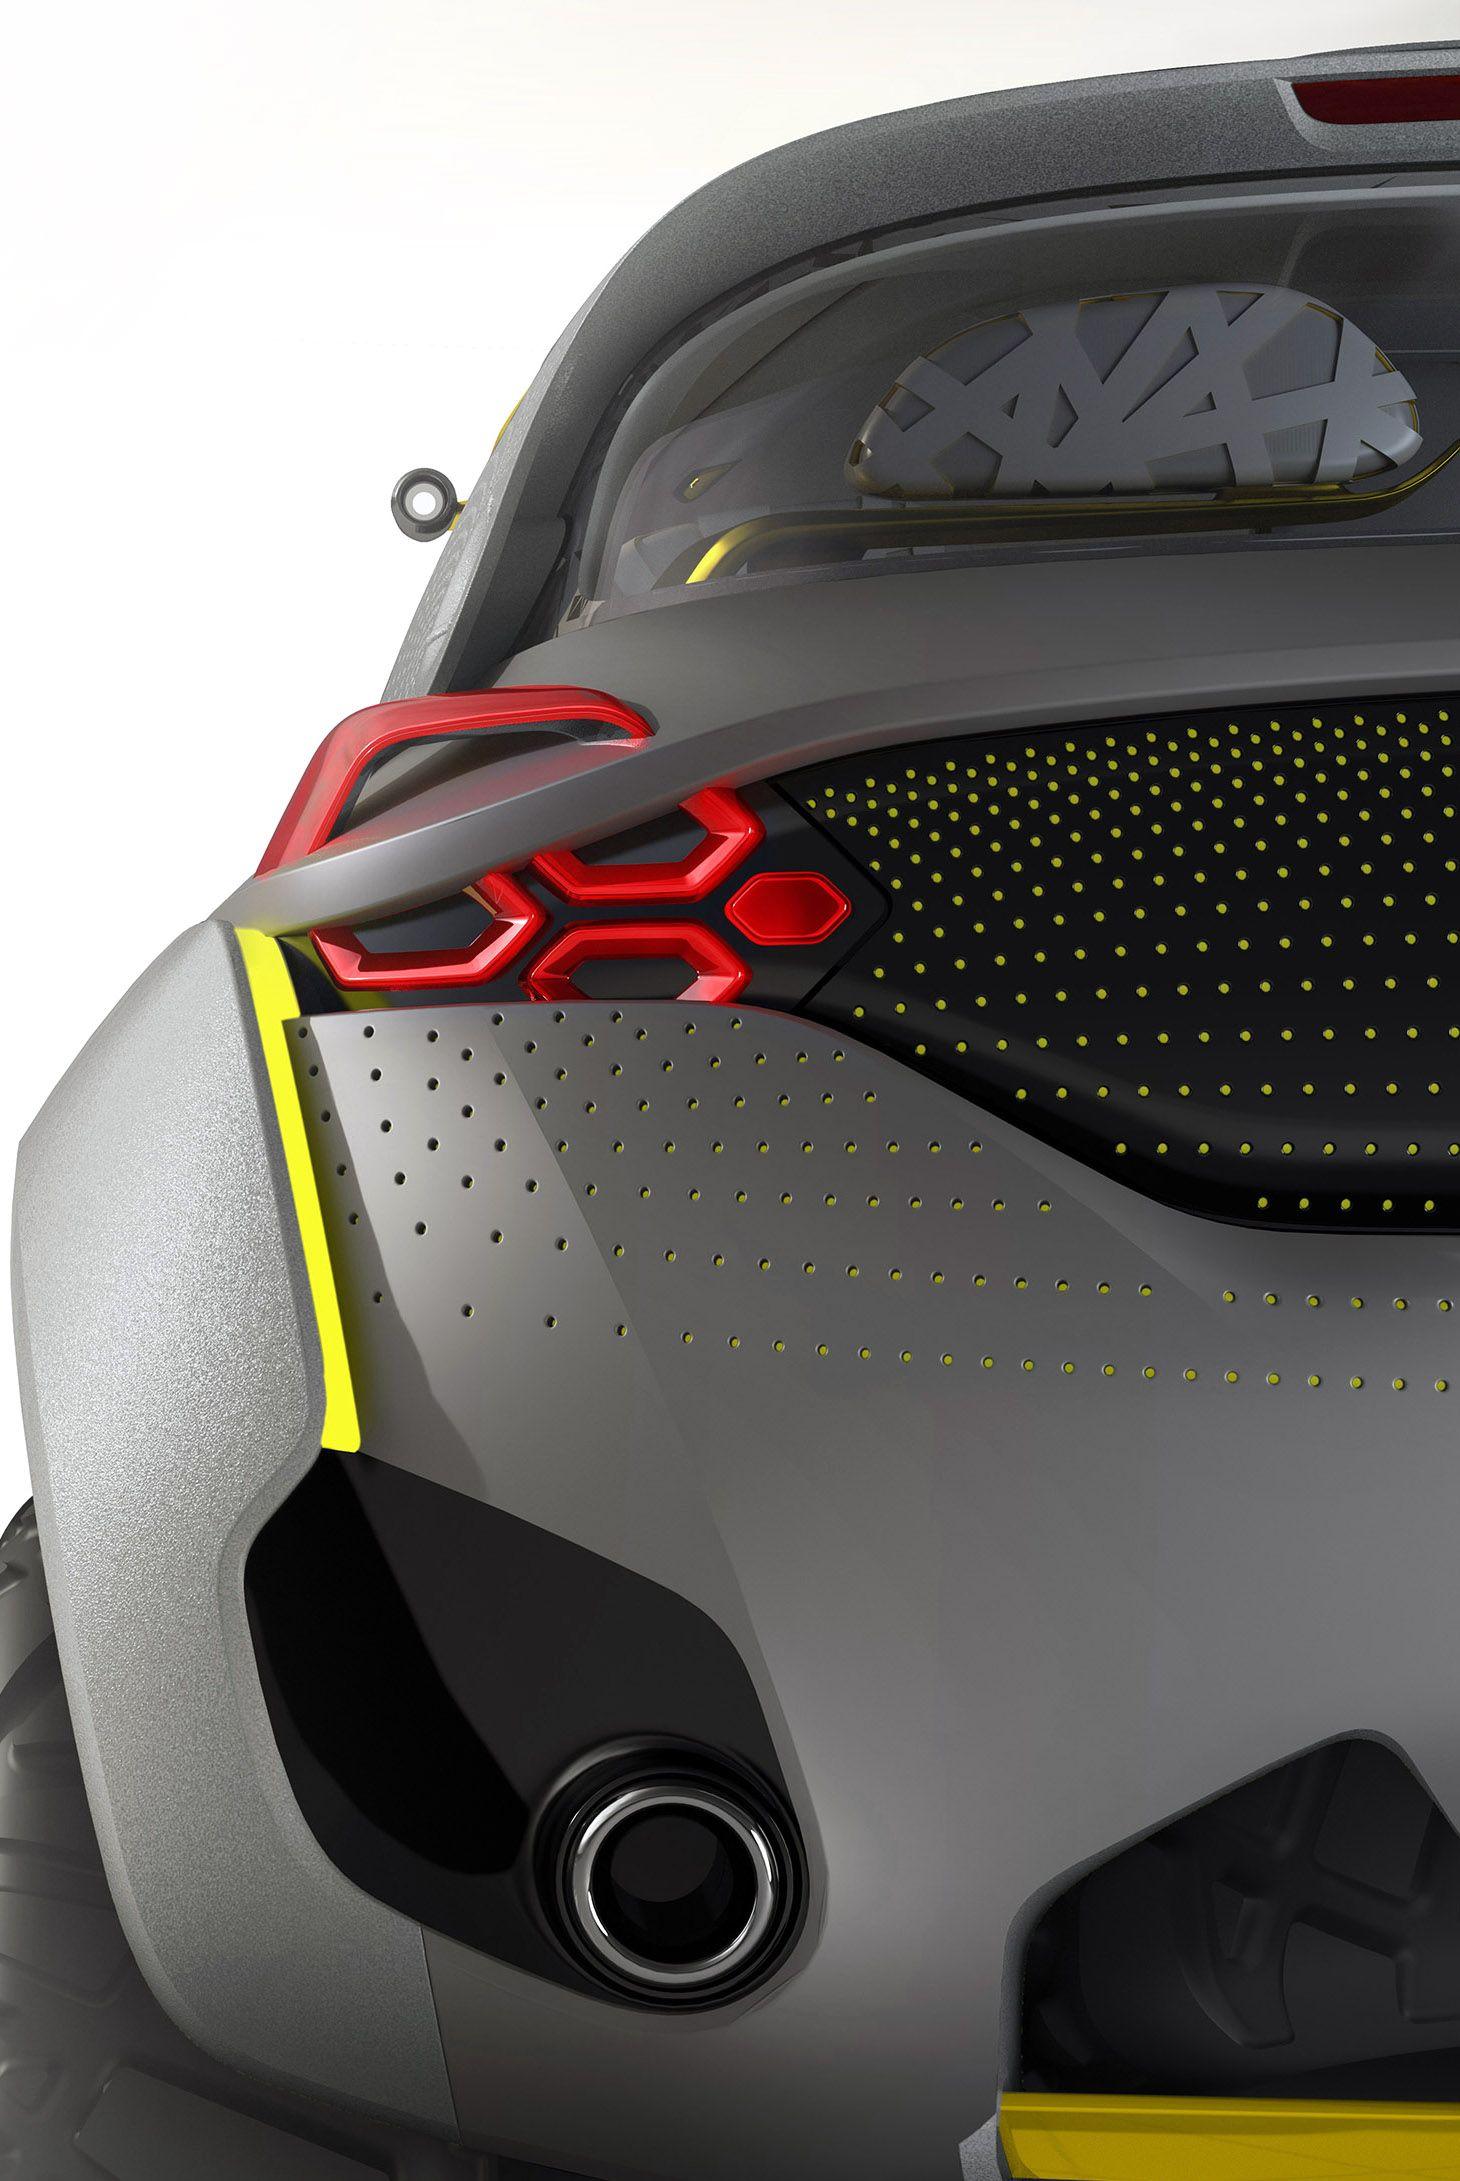 New High Tech Car Someone Help Identify Concept Cars Car Design Cars [ 2181 x 1460 Pixel ]